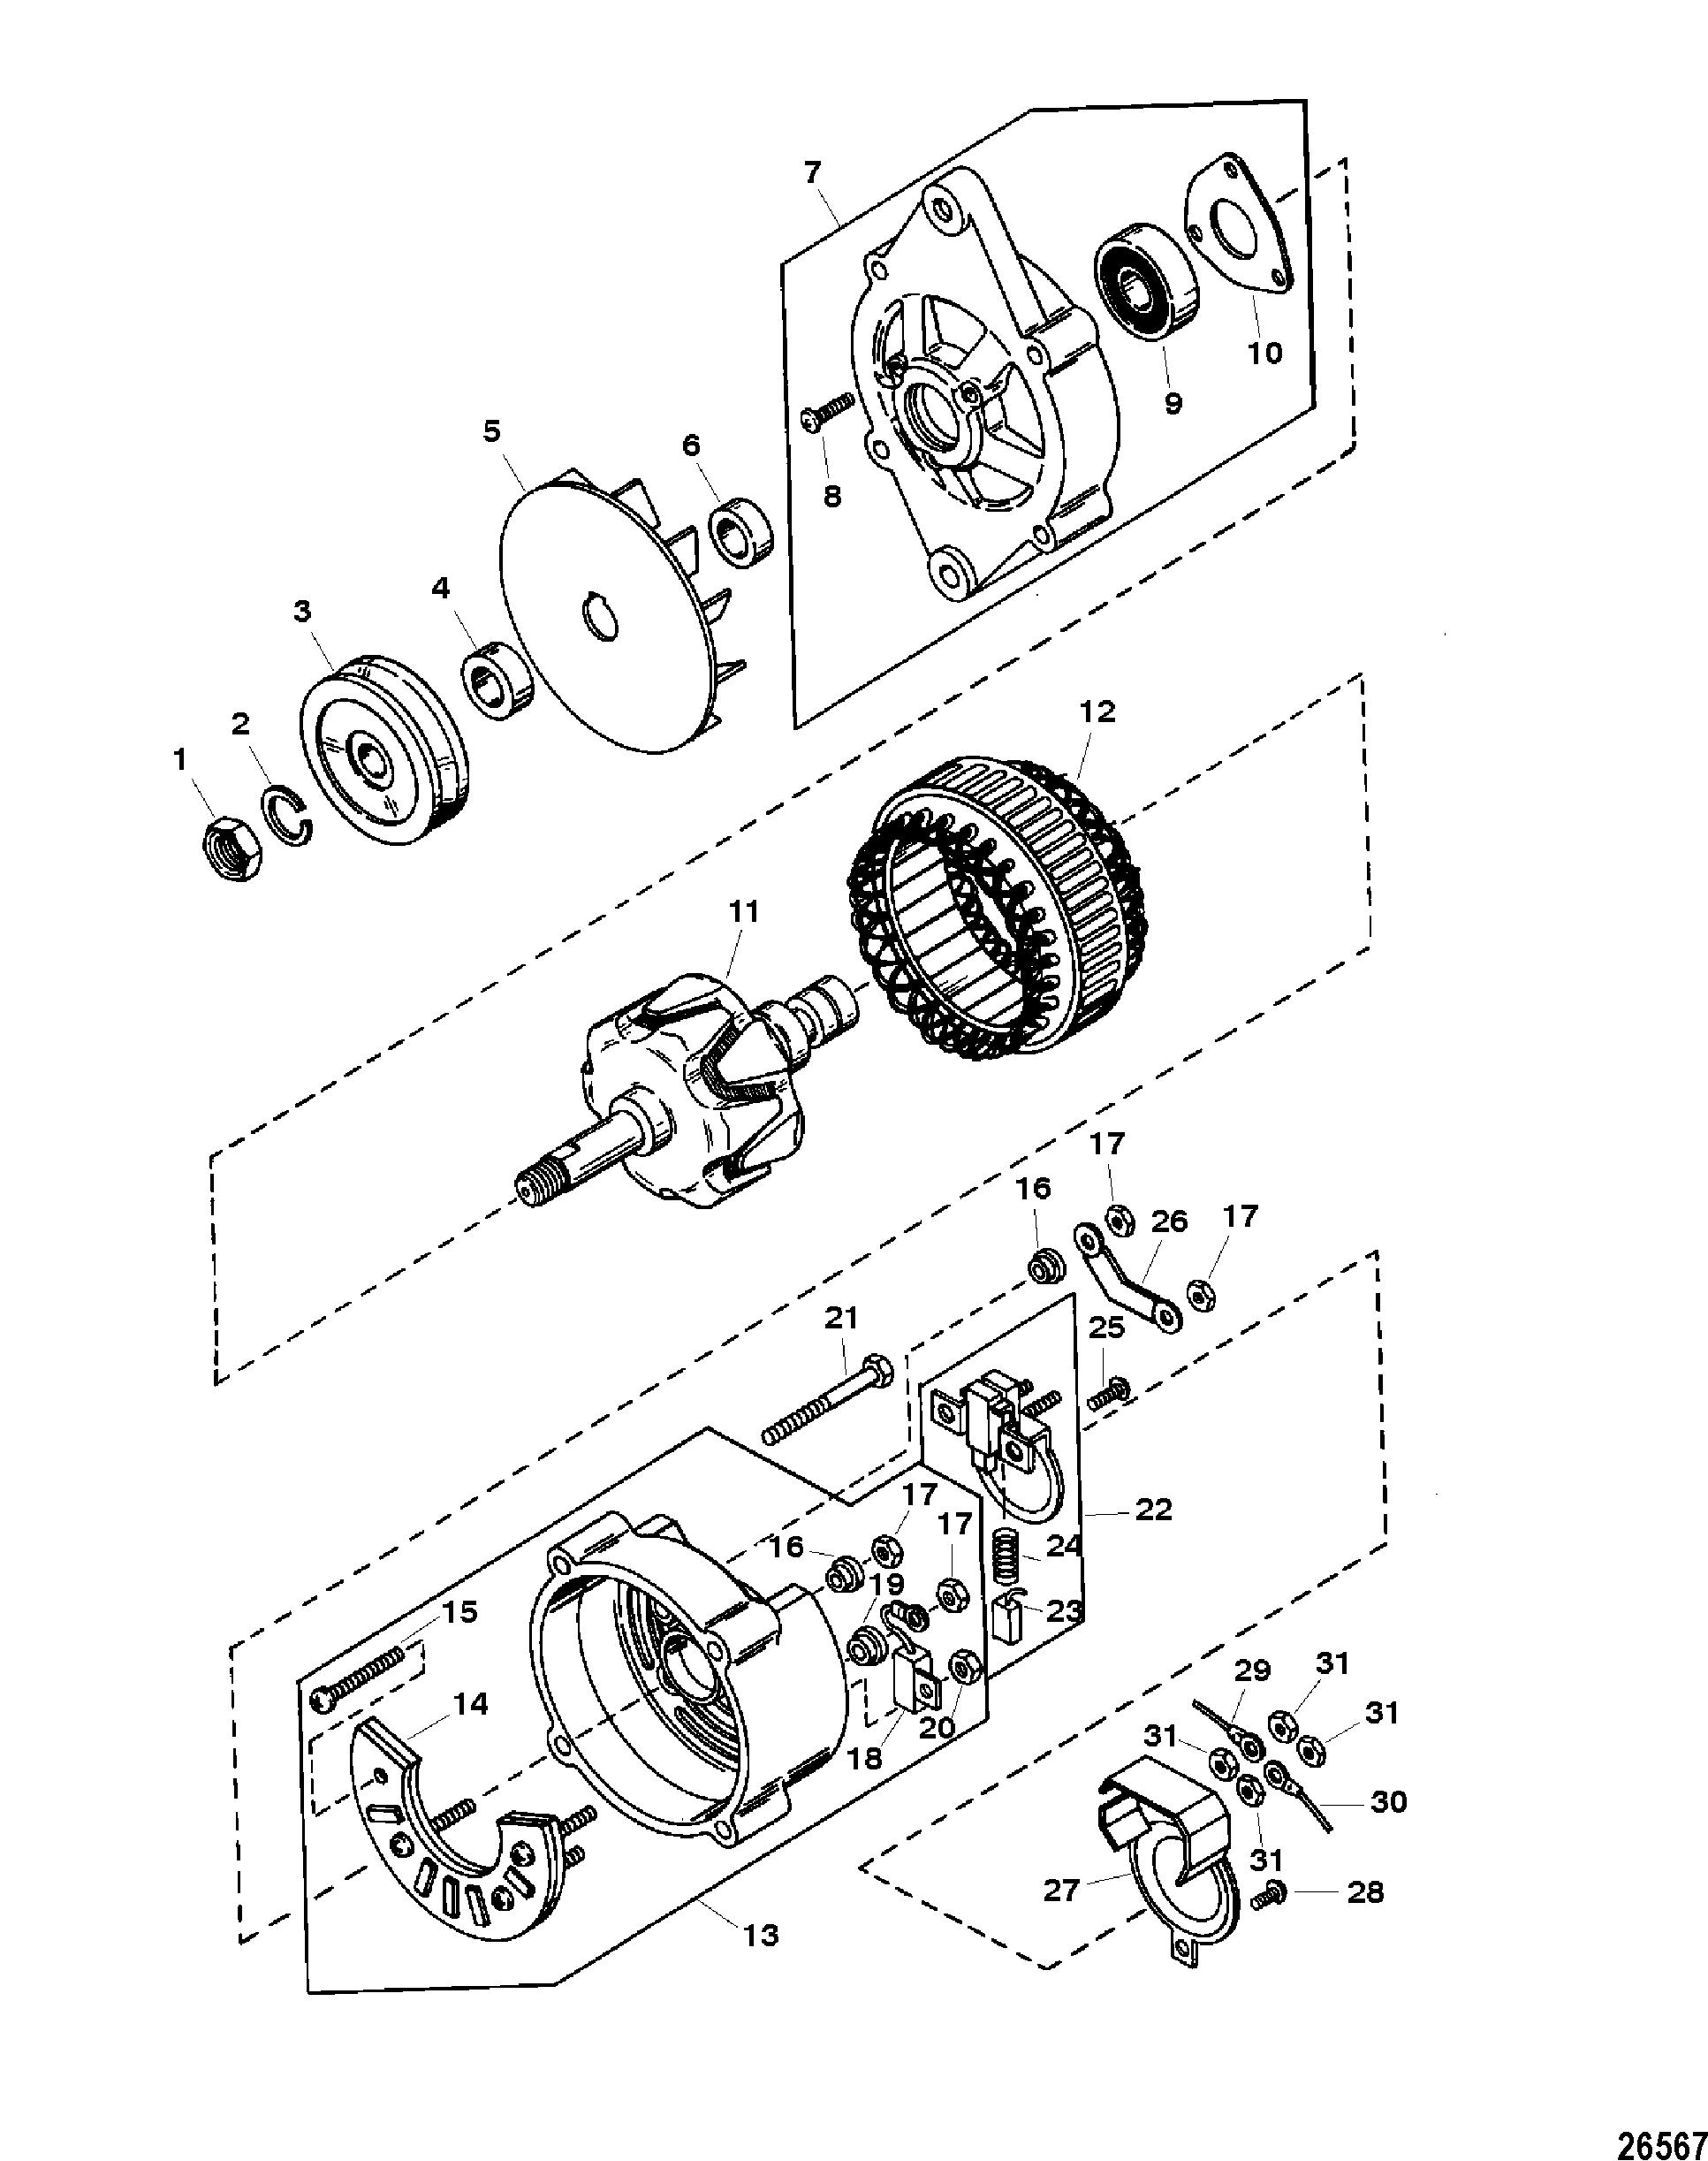 3 wire alternator wiring diagram mando wiring diagram database Marine Alternator Wiring Diagram hardin marine alternator assembly mando ac 155603 volvo penta wiring diagram 3 wire alternator wiring diagram mando